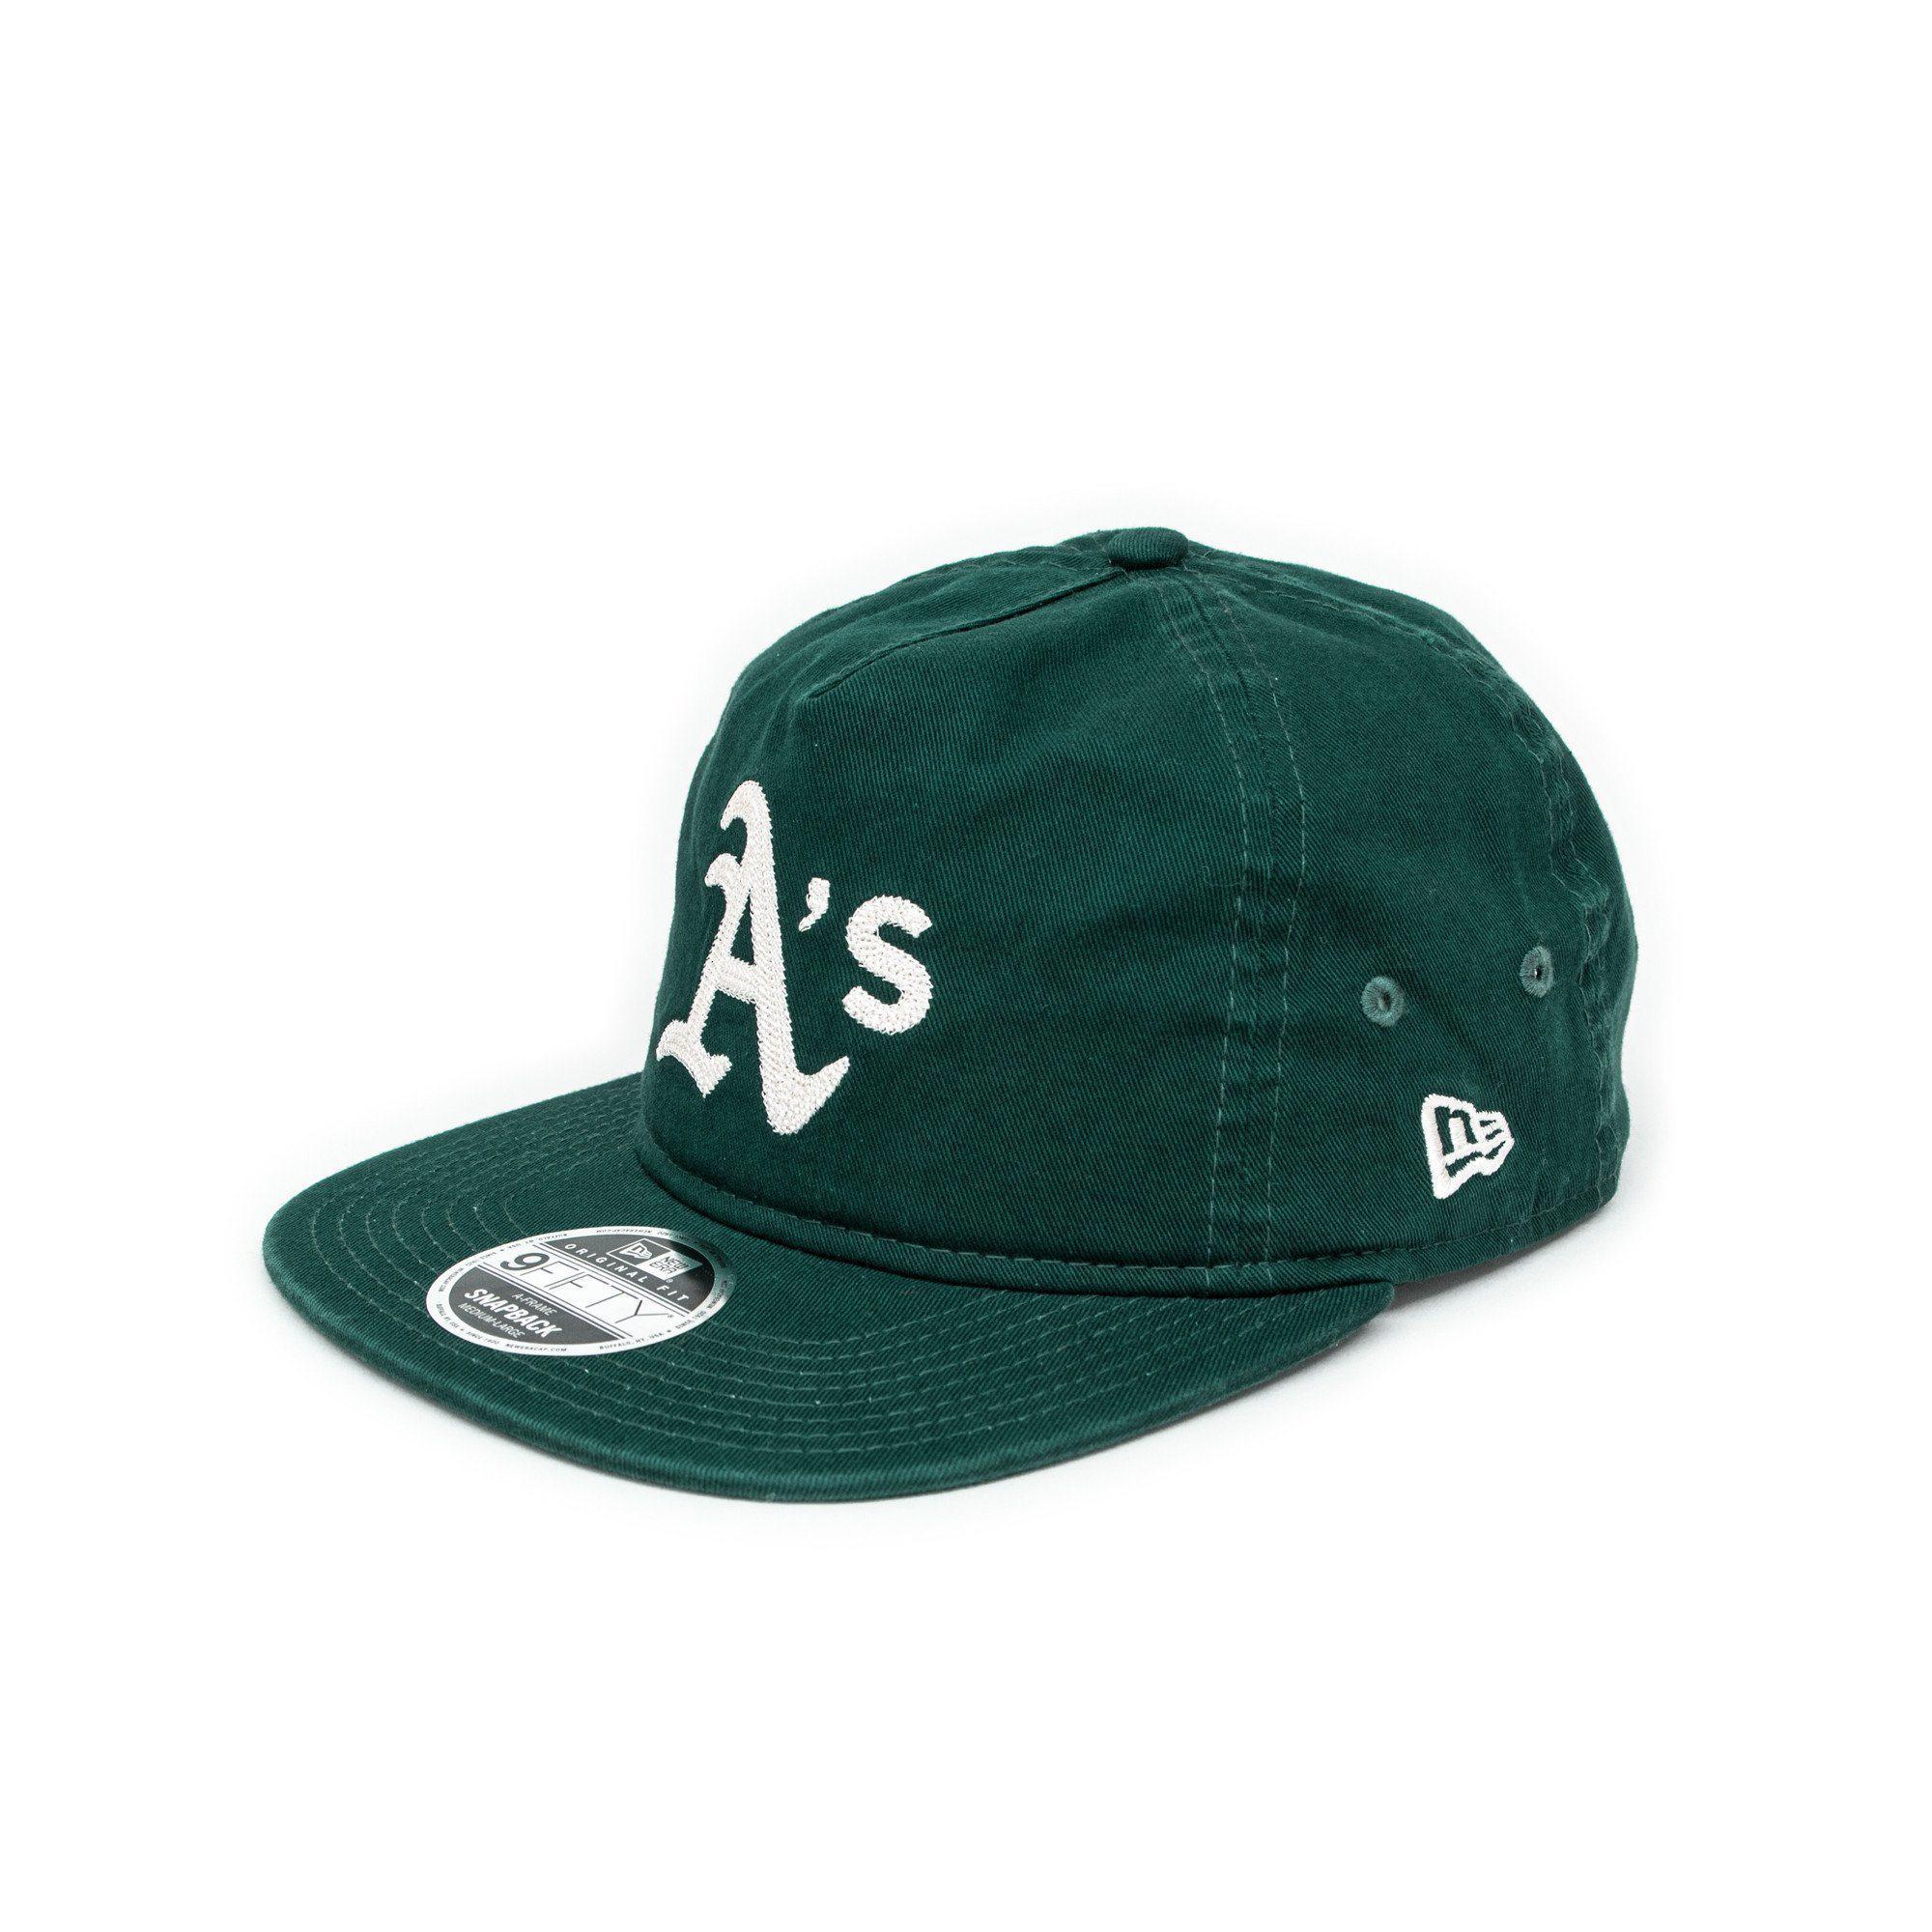 KTZ Oaklands A s Chain Stitch Logo 9fifty Cap in Green for Men - Lyst d85b268b8c10